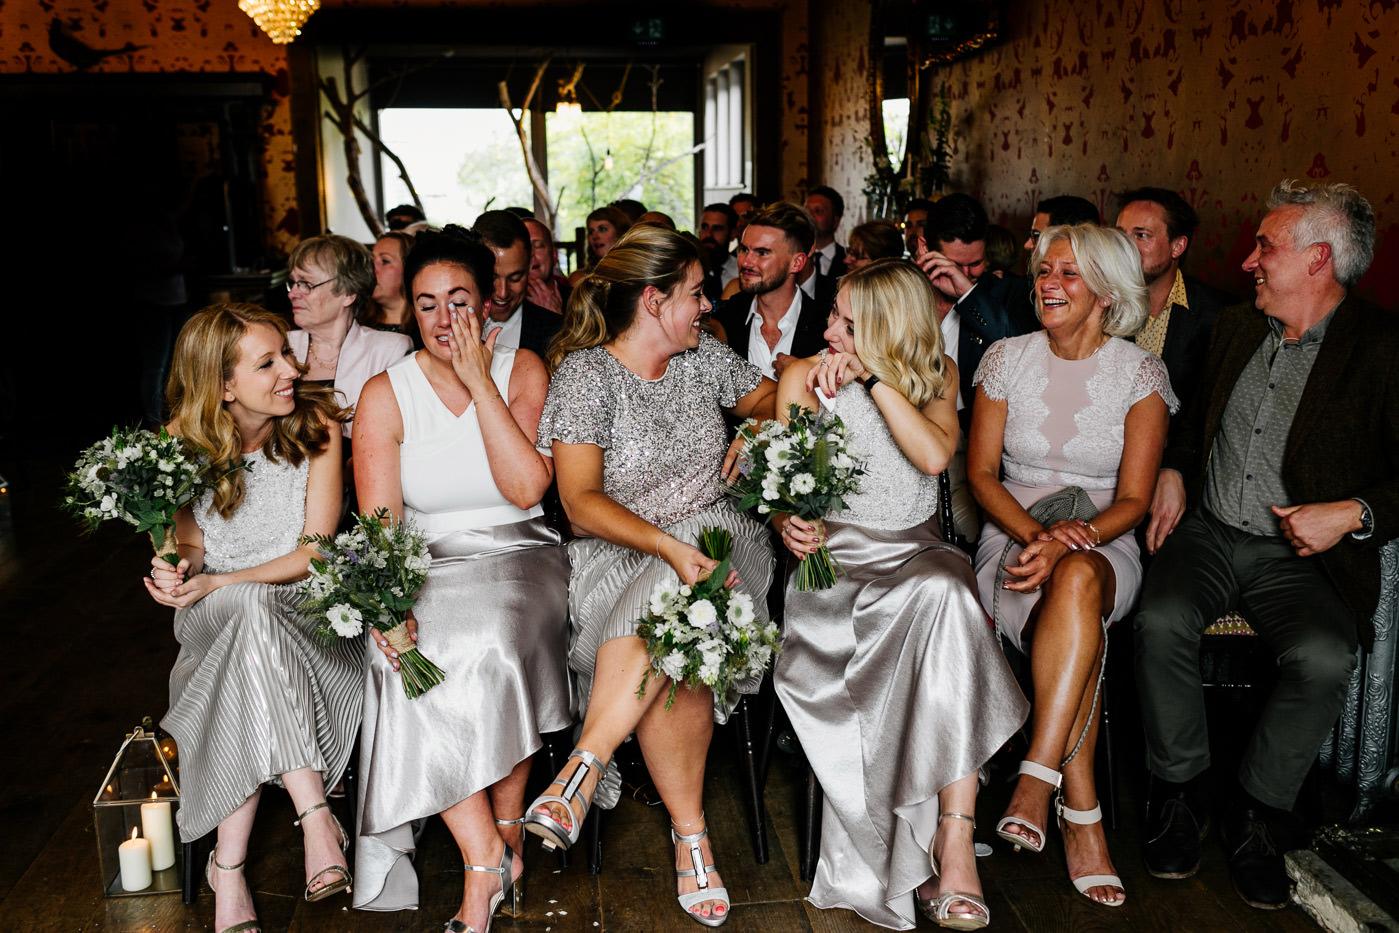 the-bell-ticehurst-pub-wedding-kent-wedding-phootgrapher-Epic-Love-Story